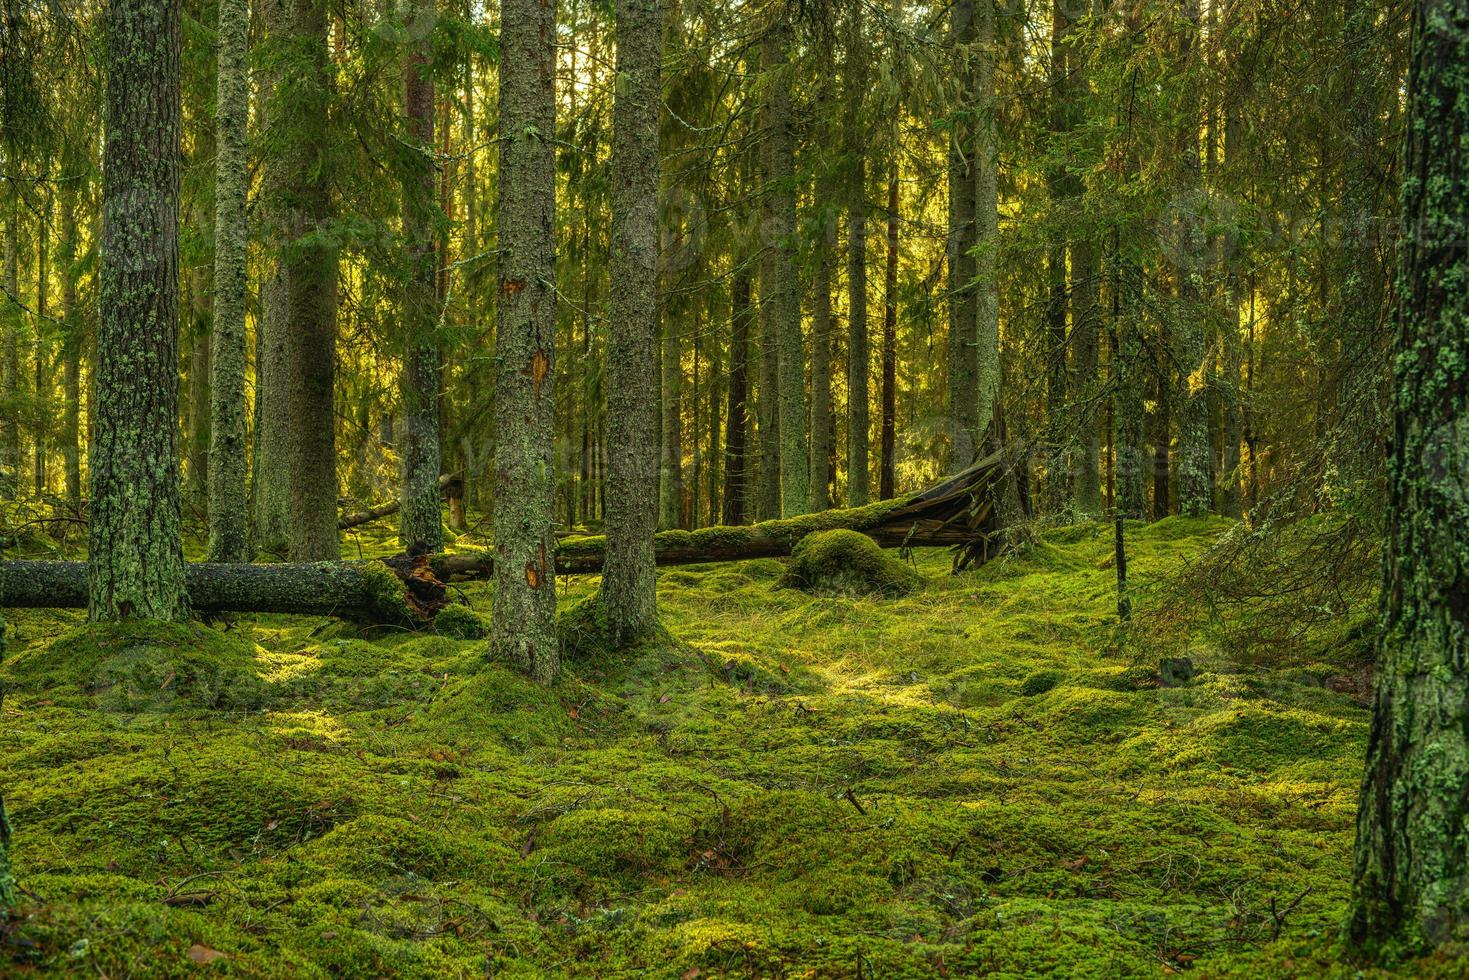 bella foresta verde di pini e abeti in Svezia foto